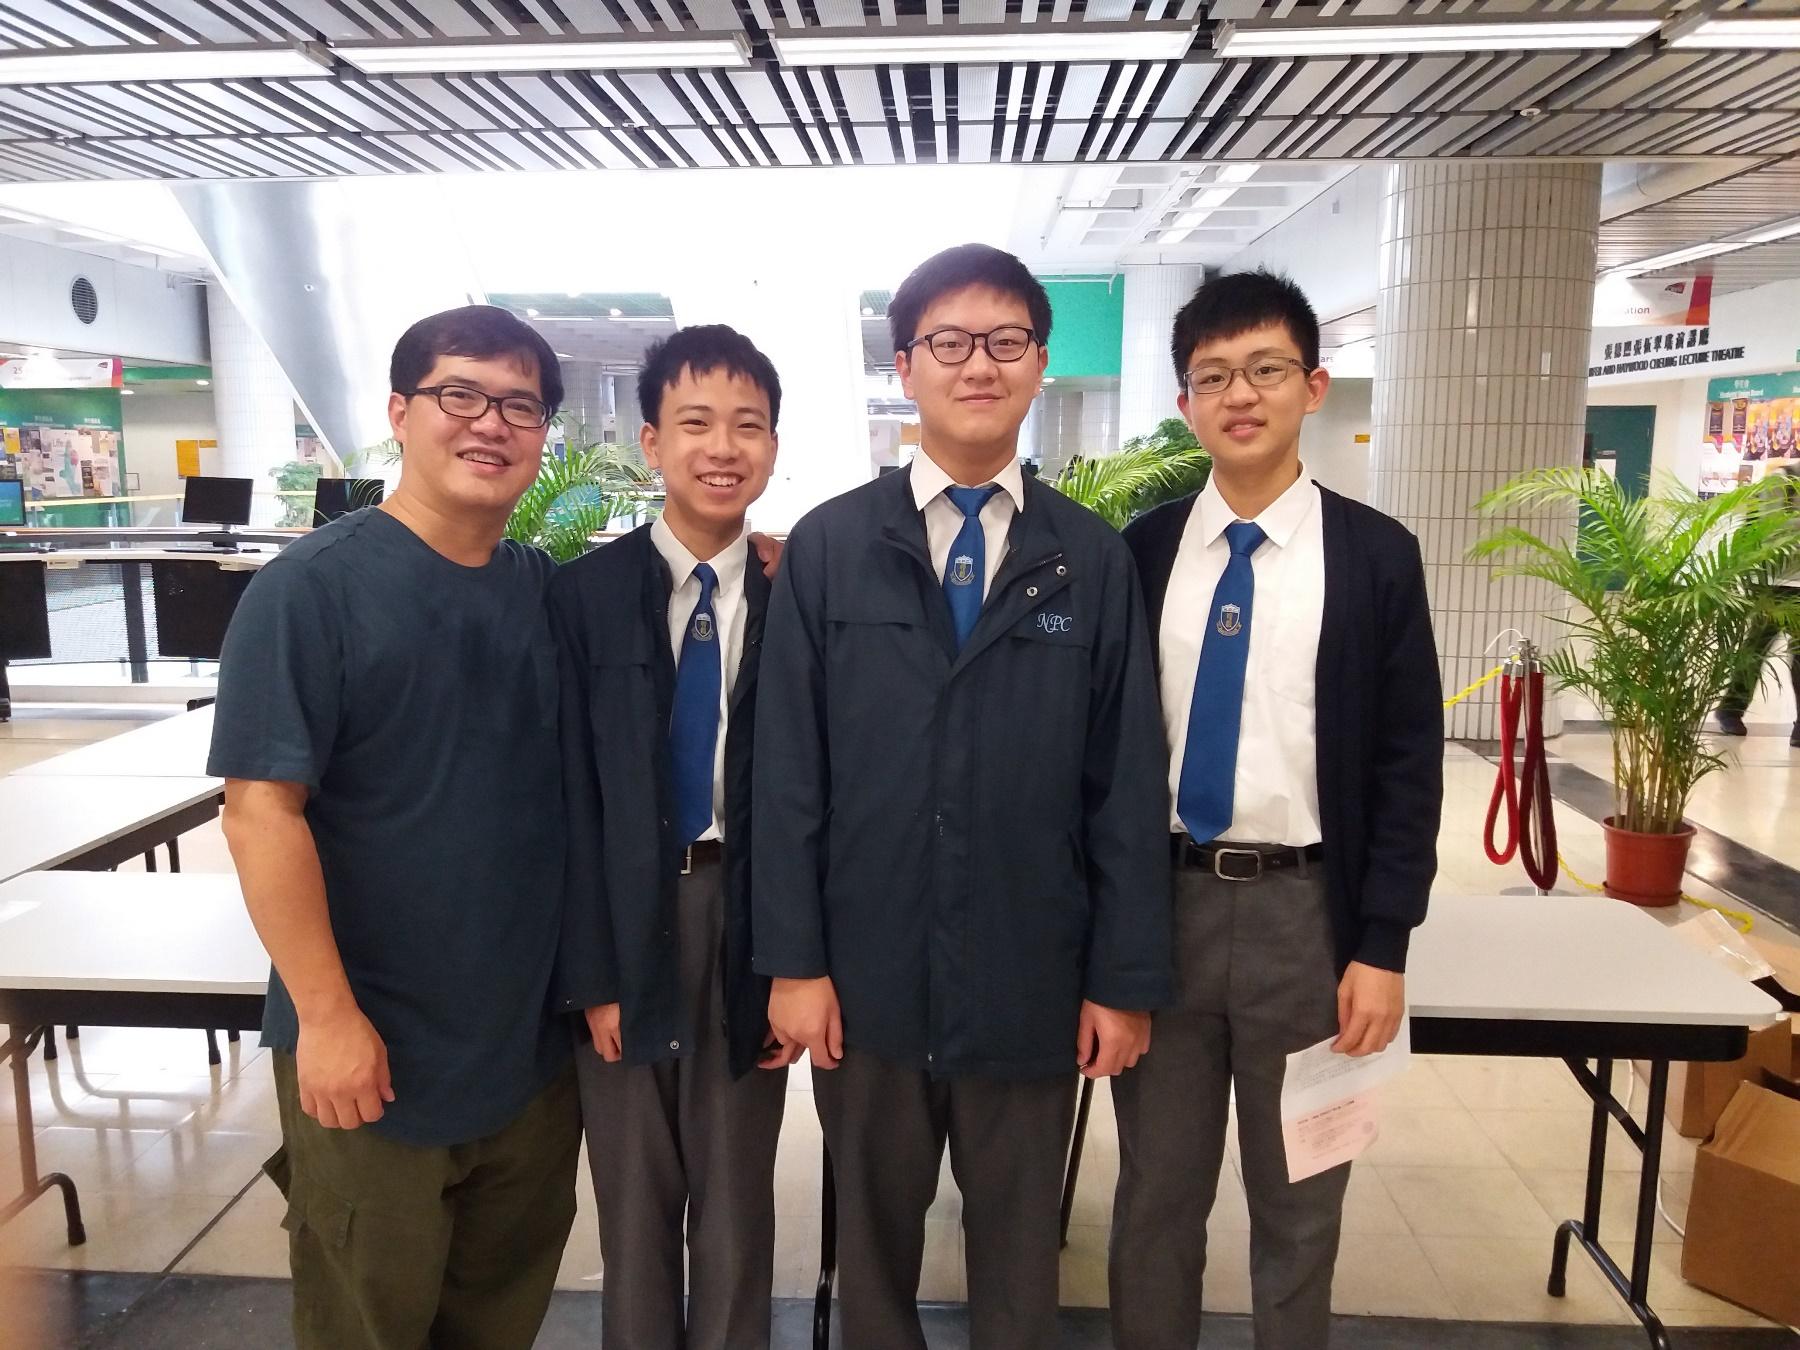 http://npc.edu.hk/sites/default/files/20190407_104843.jpg